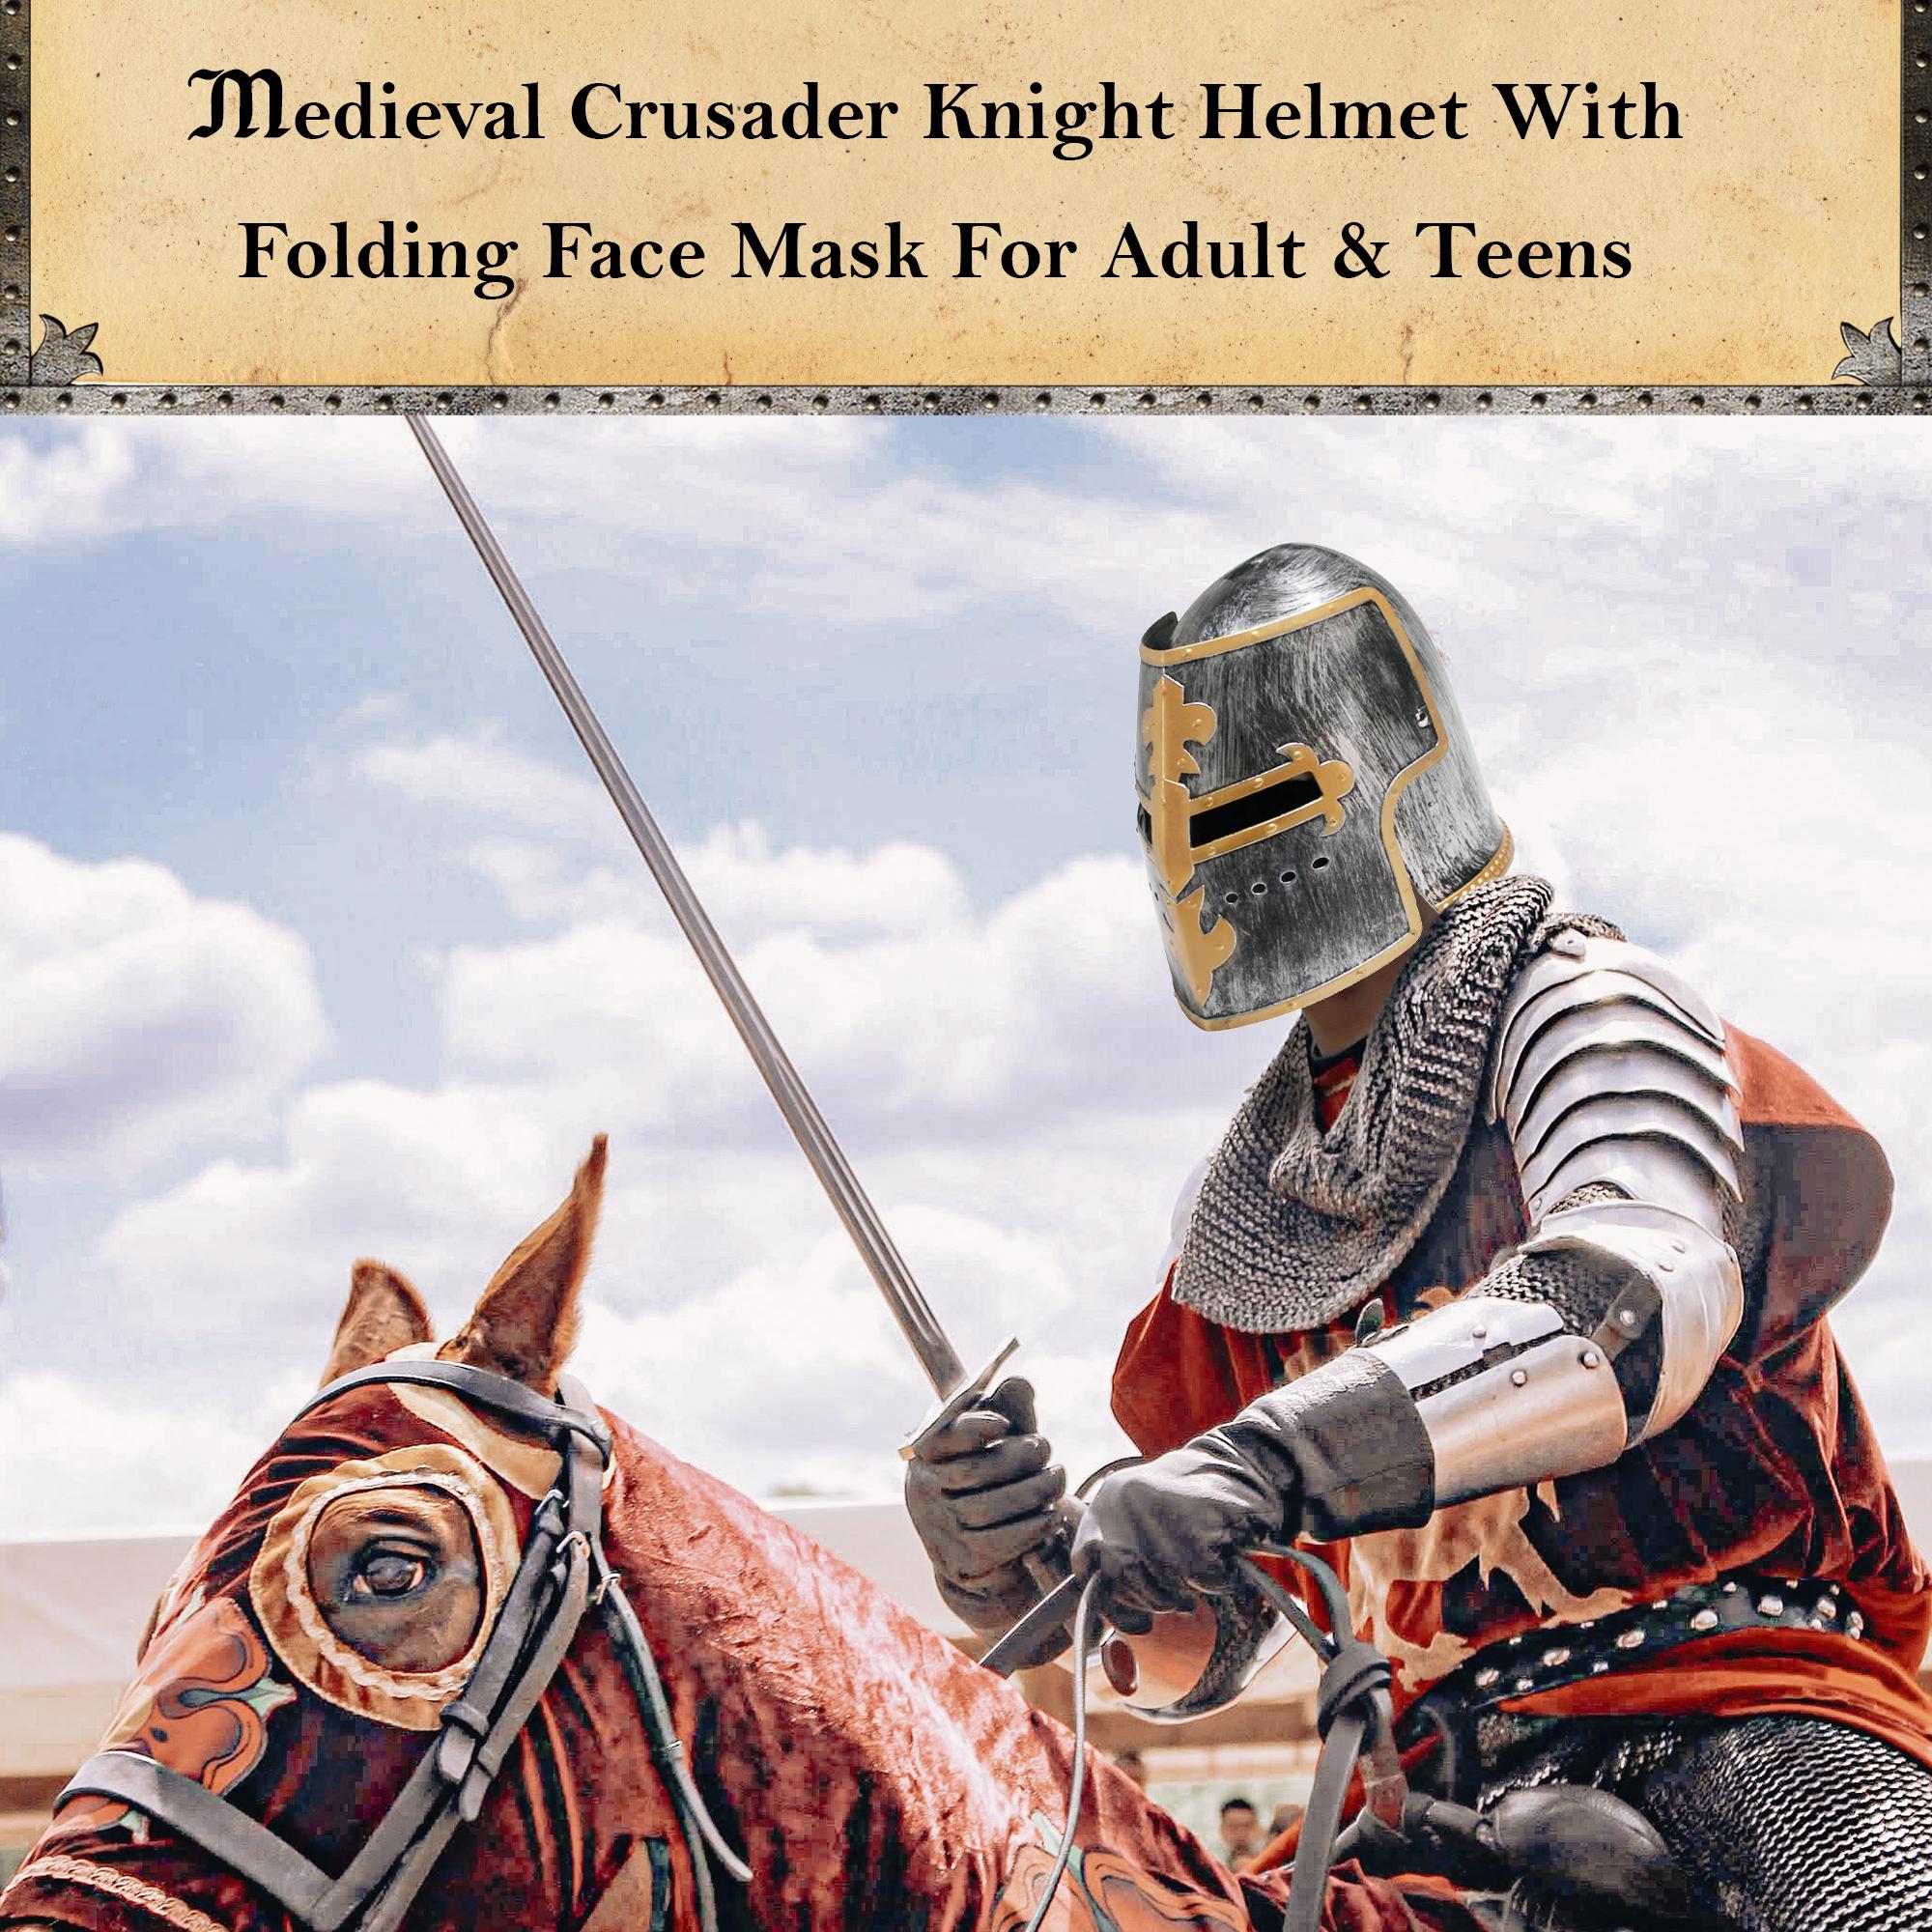 thumbnail 7 - Silver Pewter Knight Roman Armor Crusader Helmet Mask Medieval Adult Costume